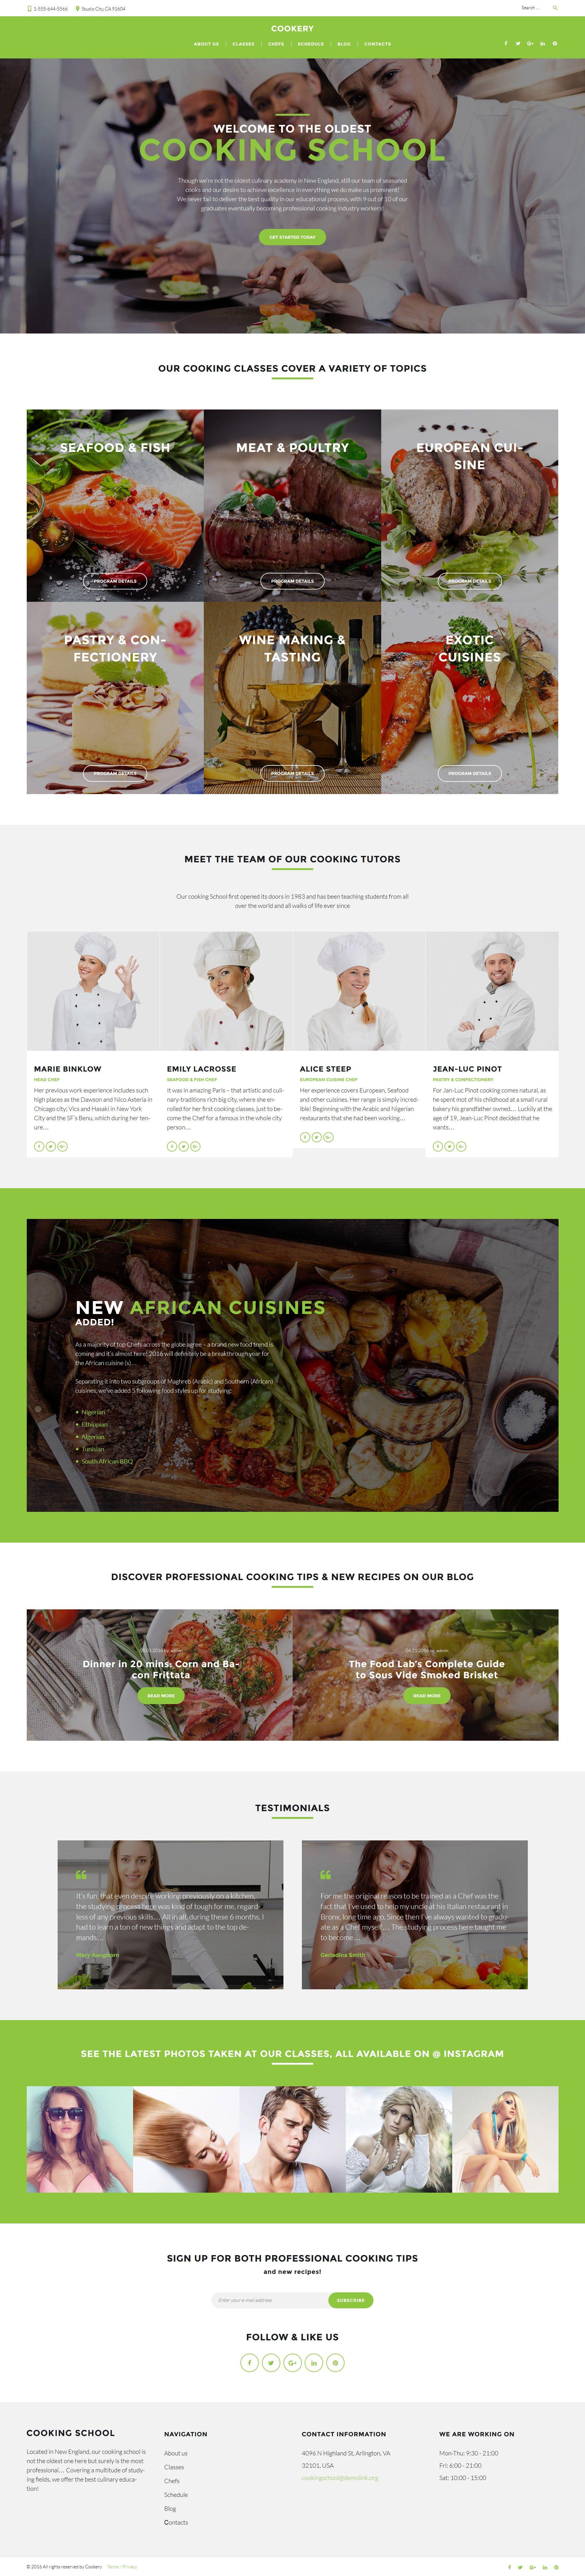 Адаптивный шаблон сайта на тему кулинарная школа #60130